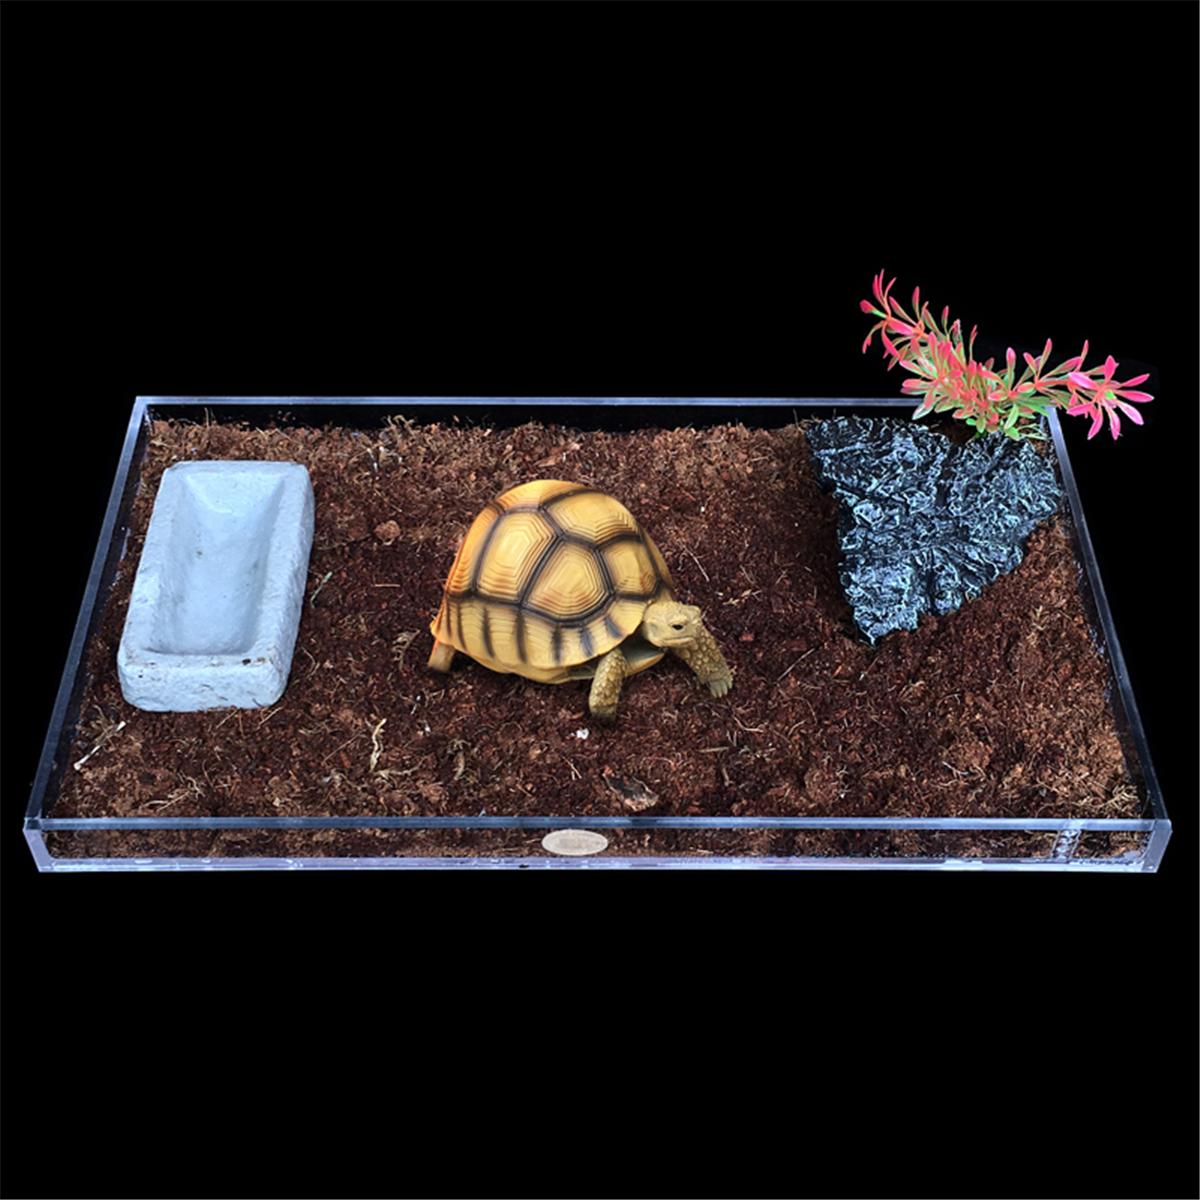 Meigar  Acrylic Pet Reptile Turtle Tank Clear Pan Holder Water Platform Decor S/M/L Size